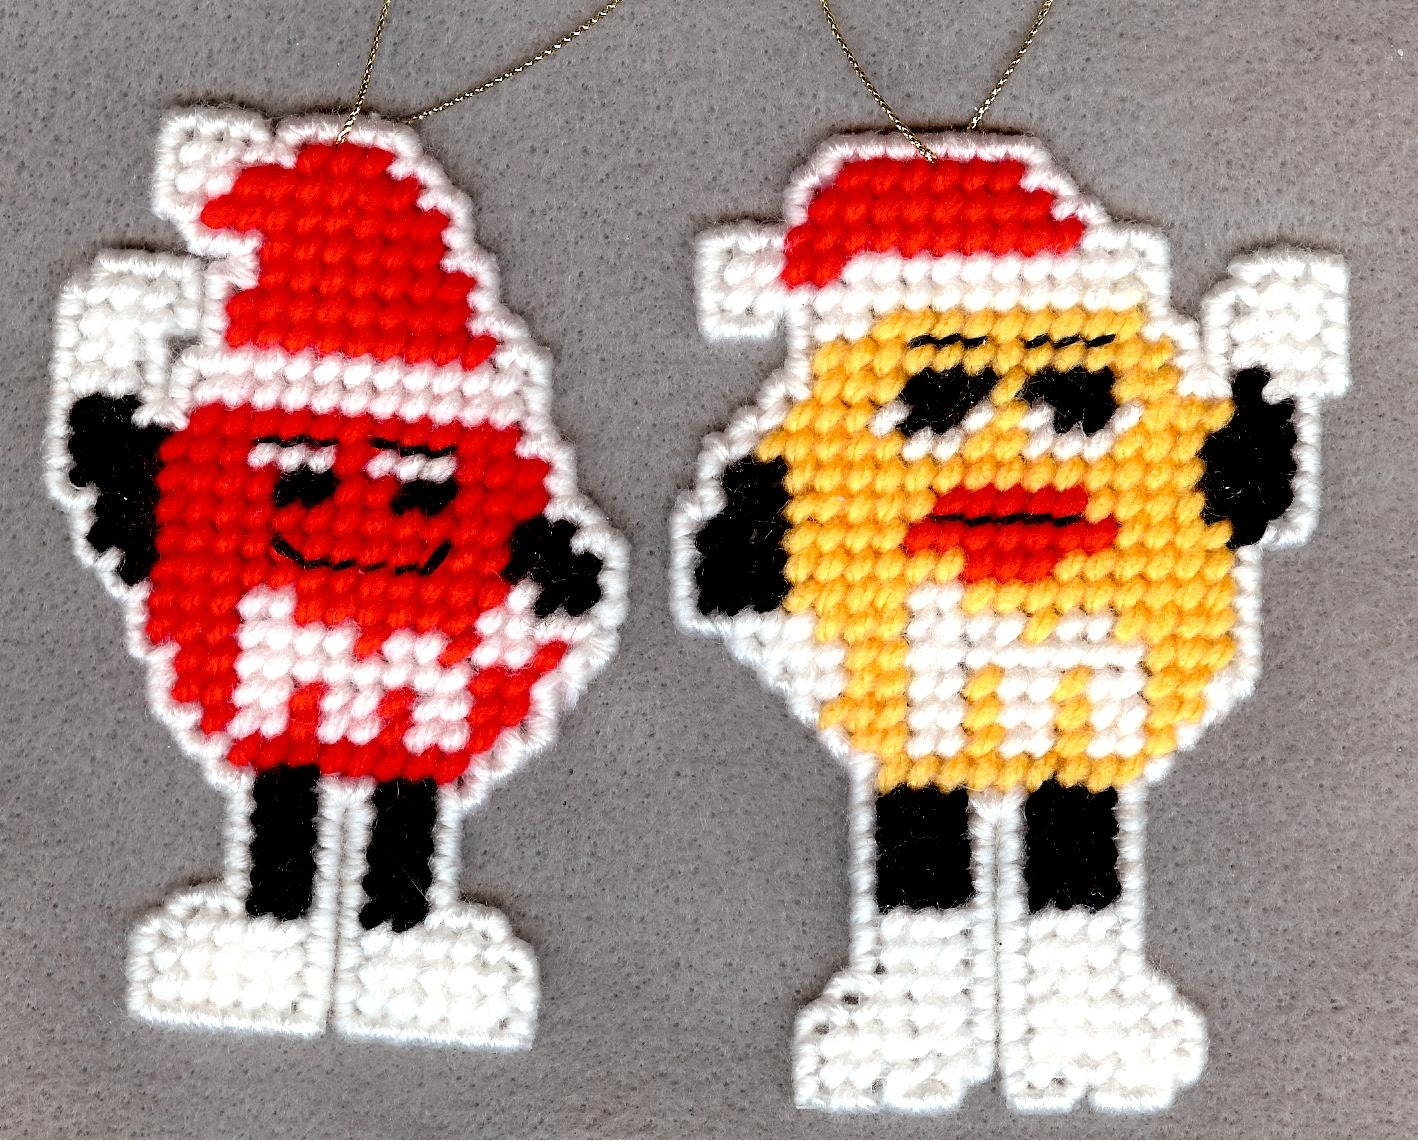 m m characters christmas ornaments plastic canvas set of 4. Black Bedroom Furniture Sets. Home Design Ideas